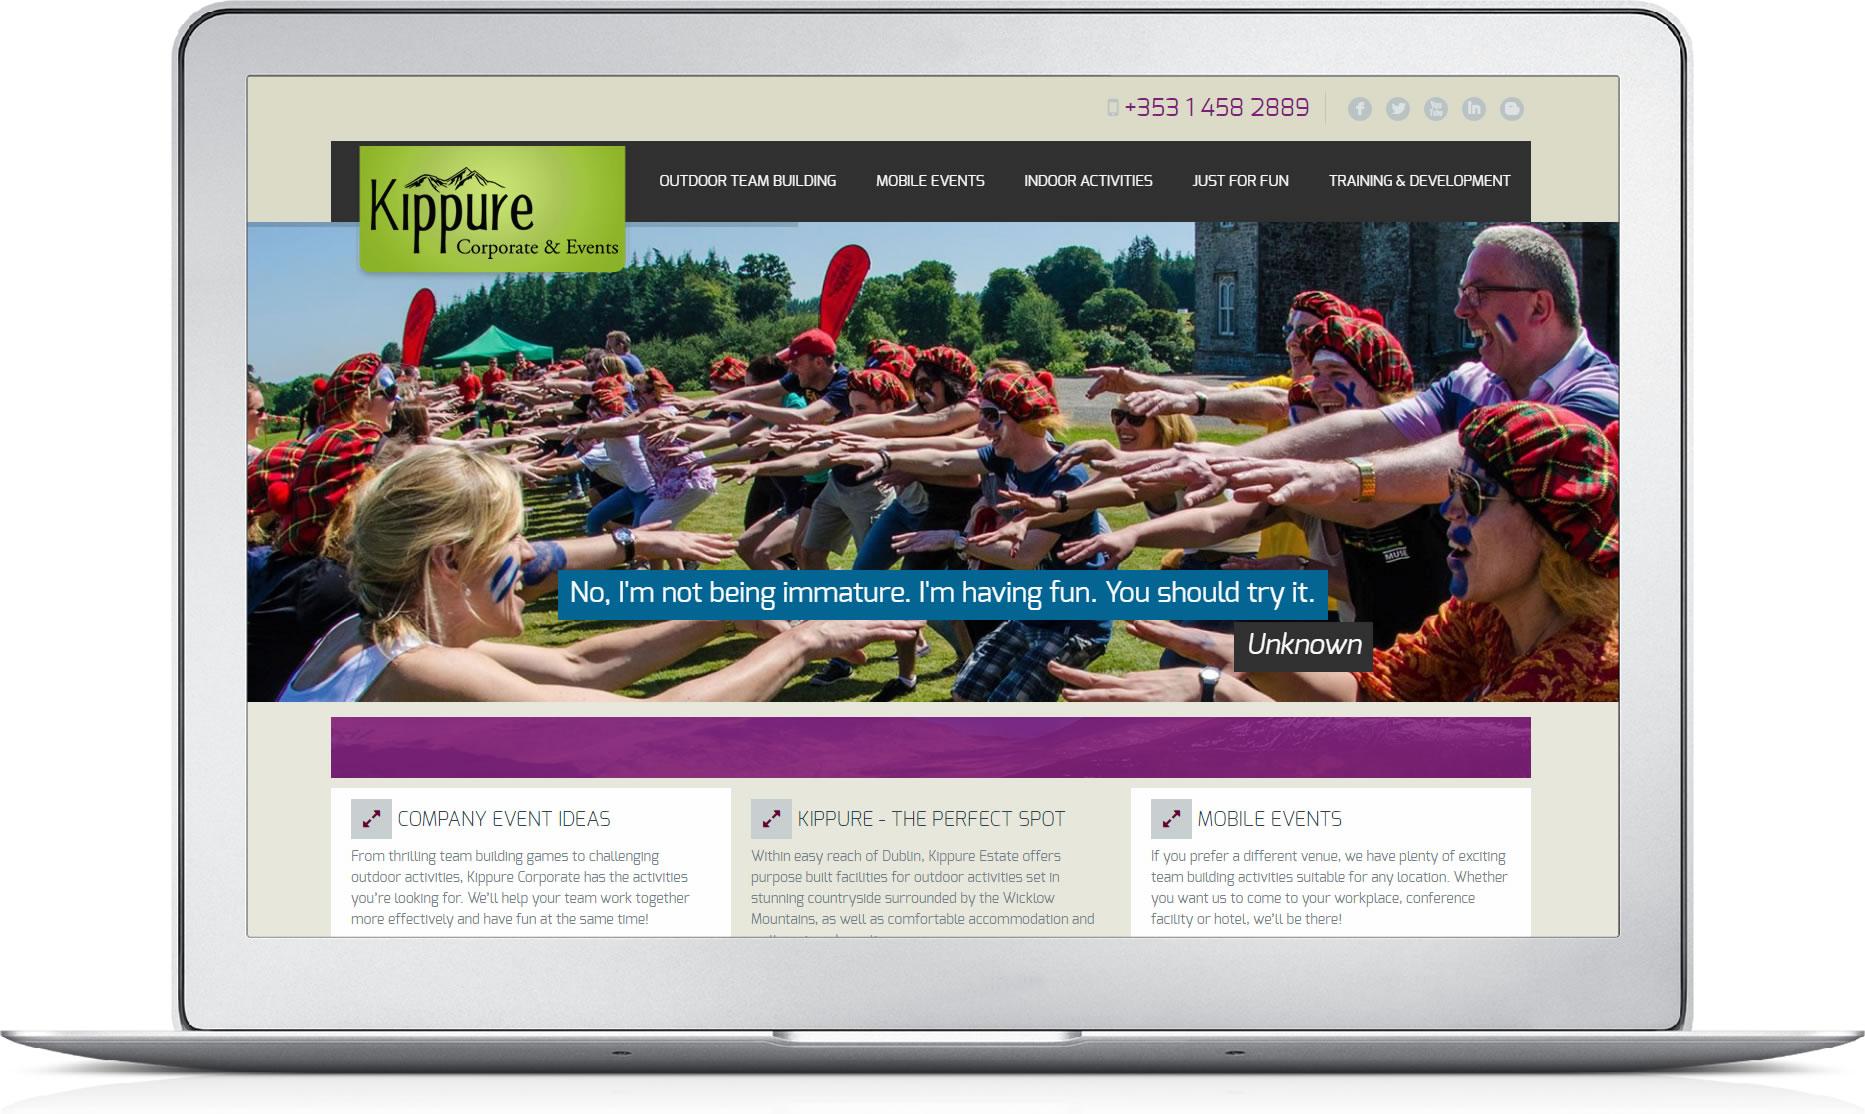 Kippure Corporate & Events - Team Building Ireland